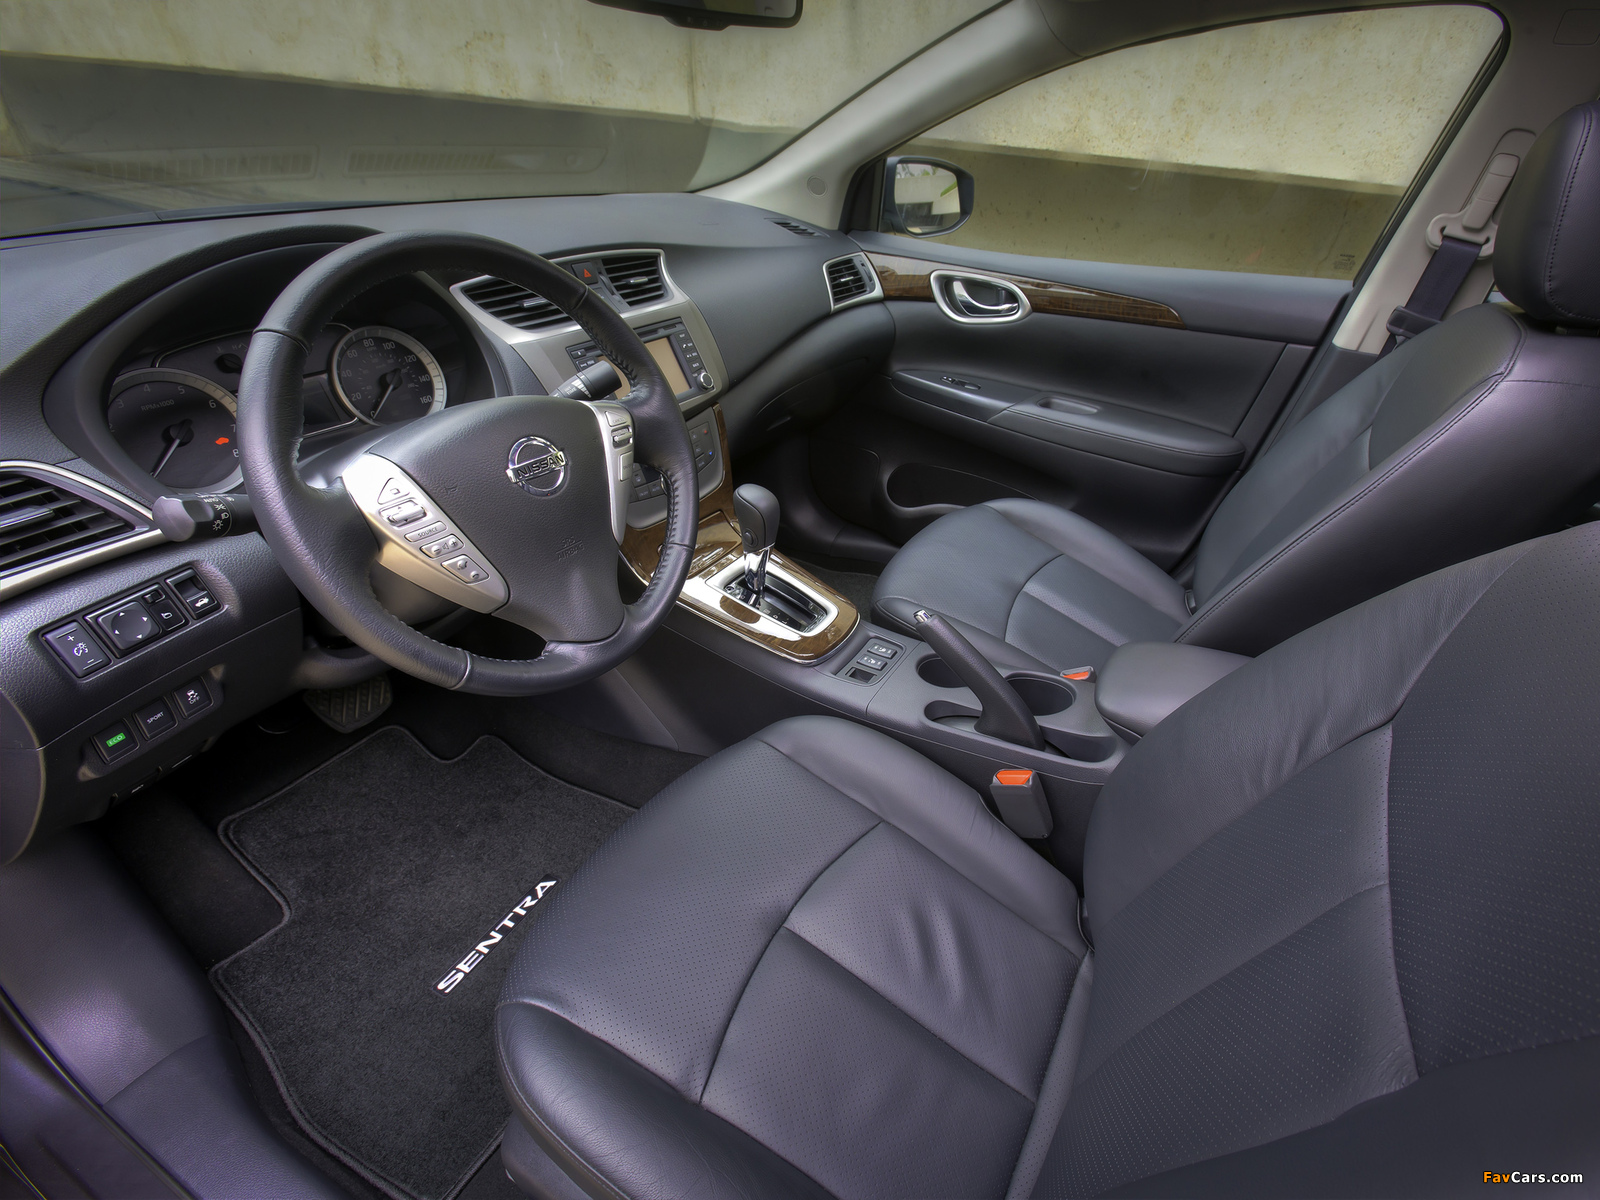 Nissan Sentra SL (B17) 2012 photos (1600 x 1200)